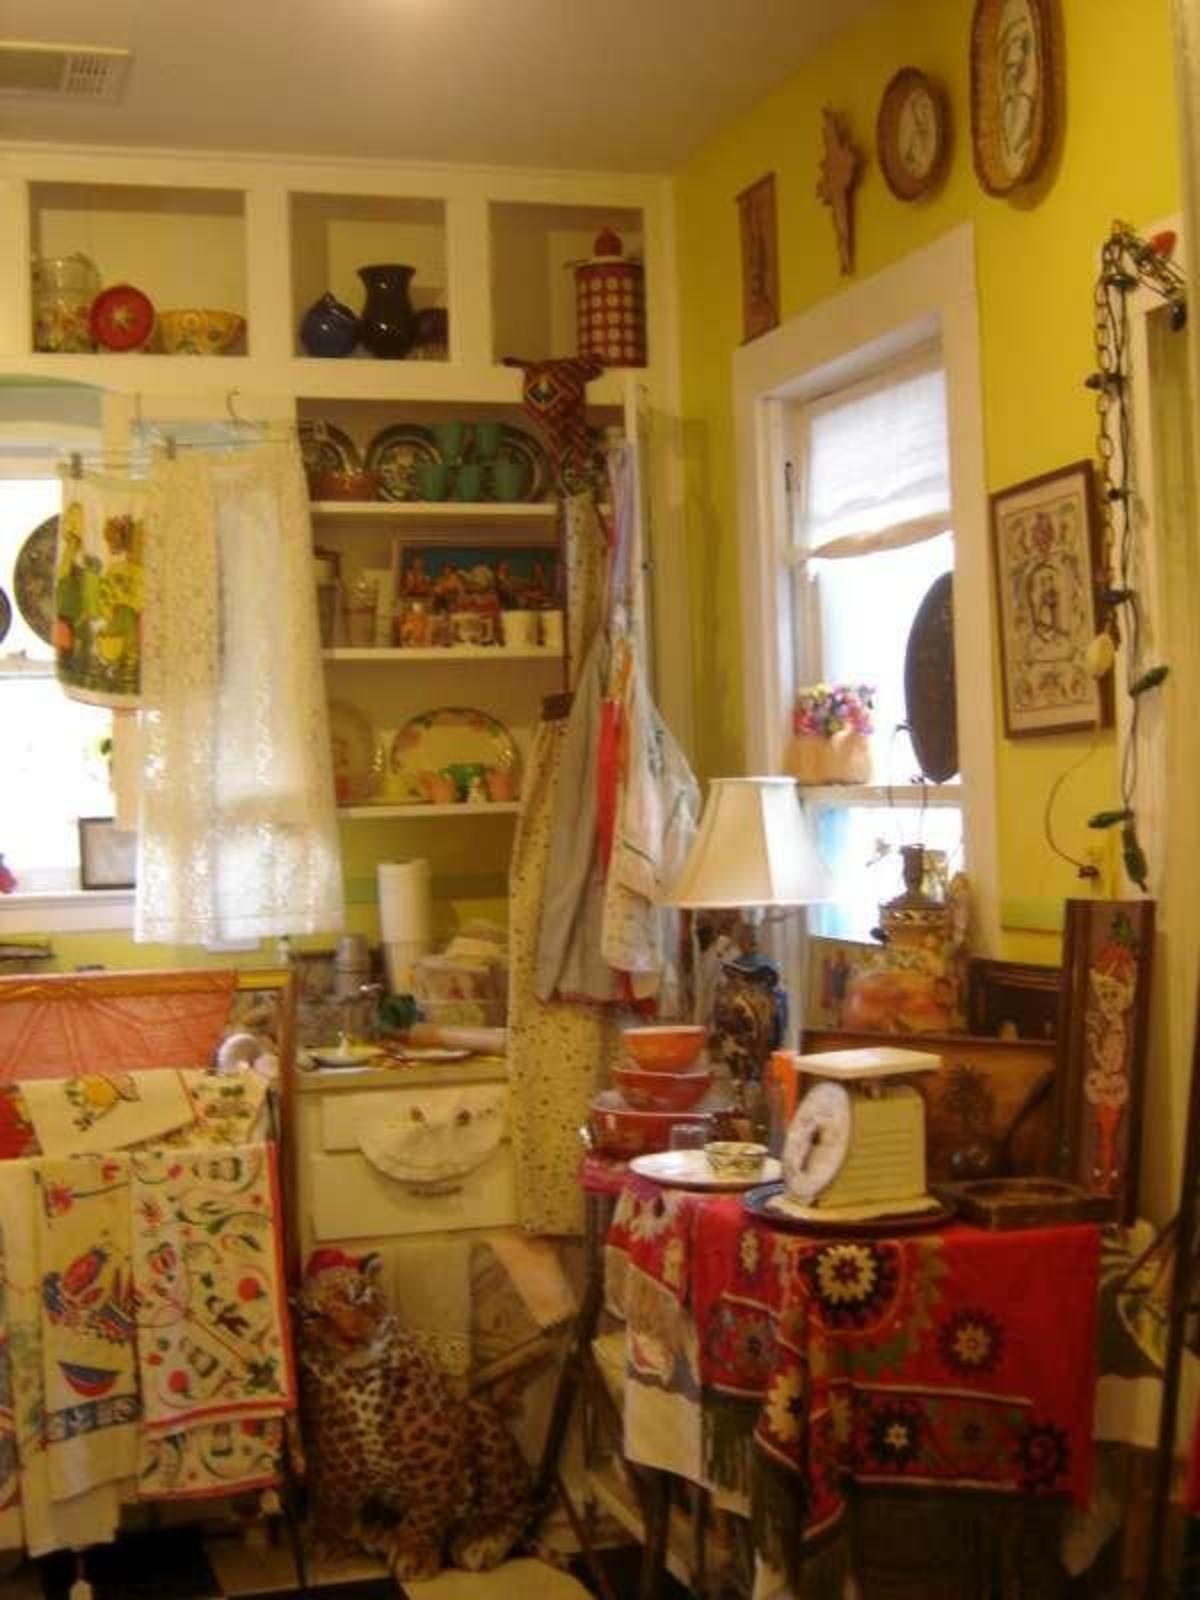 Austin Photo: Places_shopping_flashback_vintage_kitchen